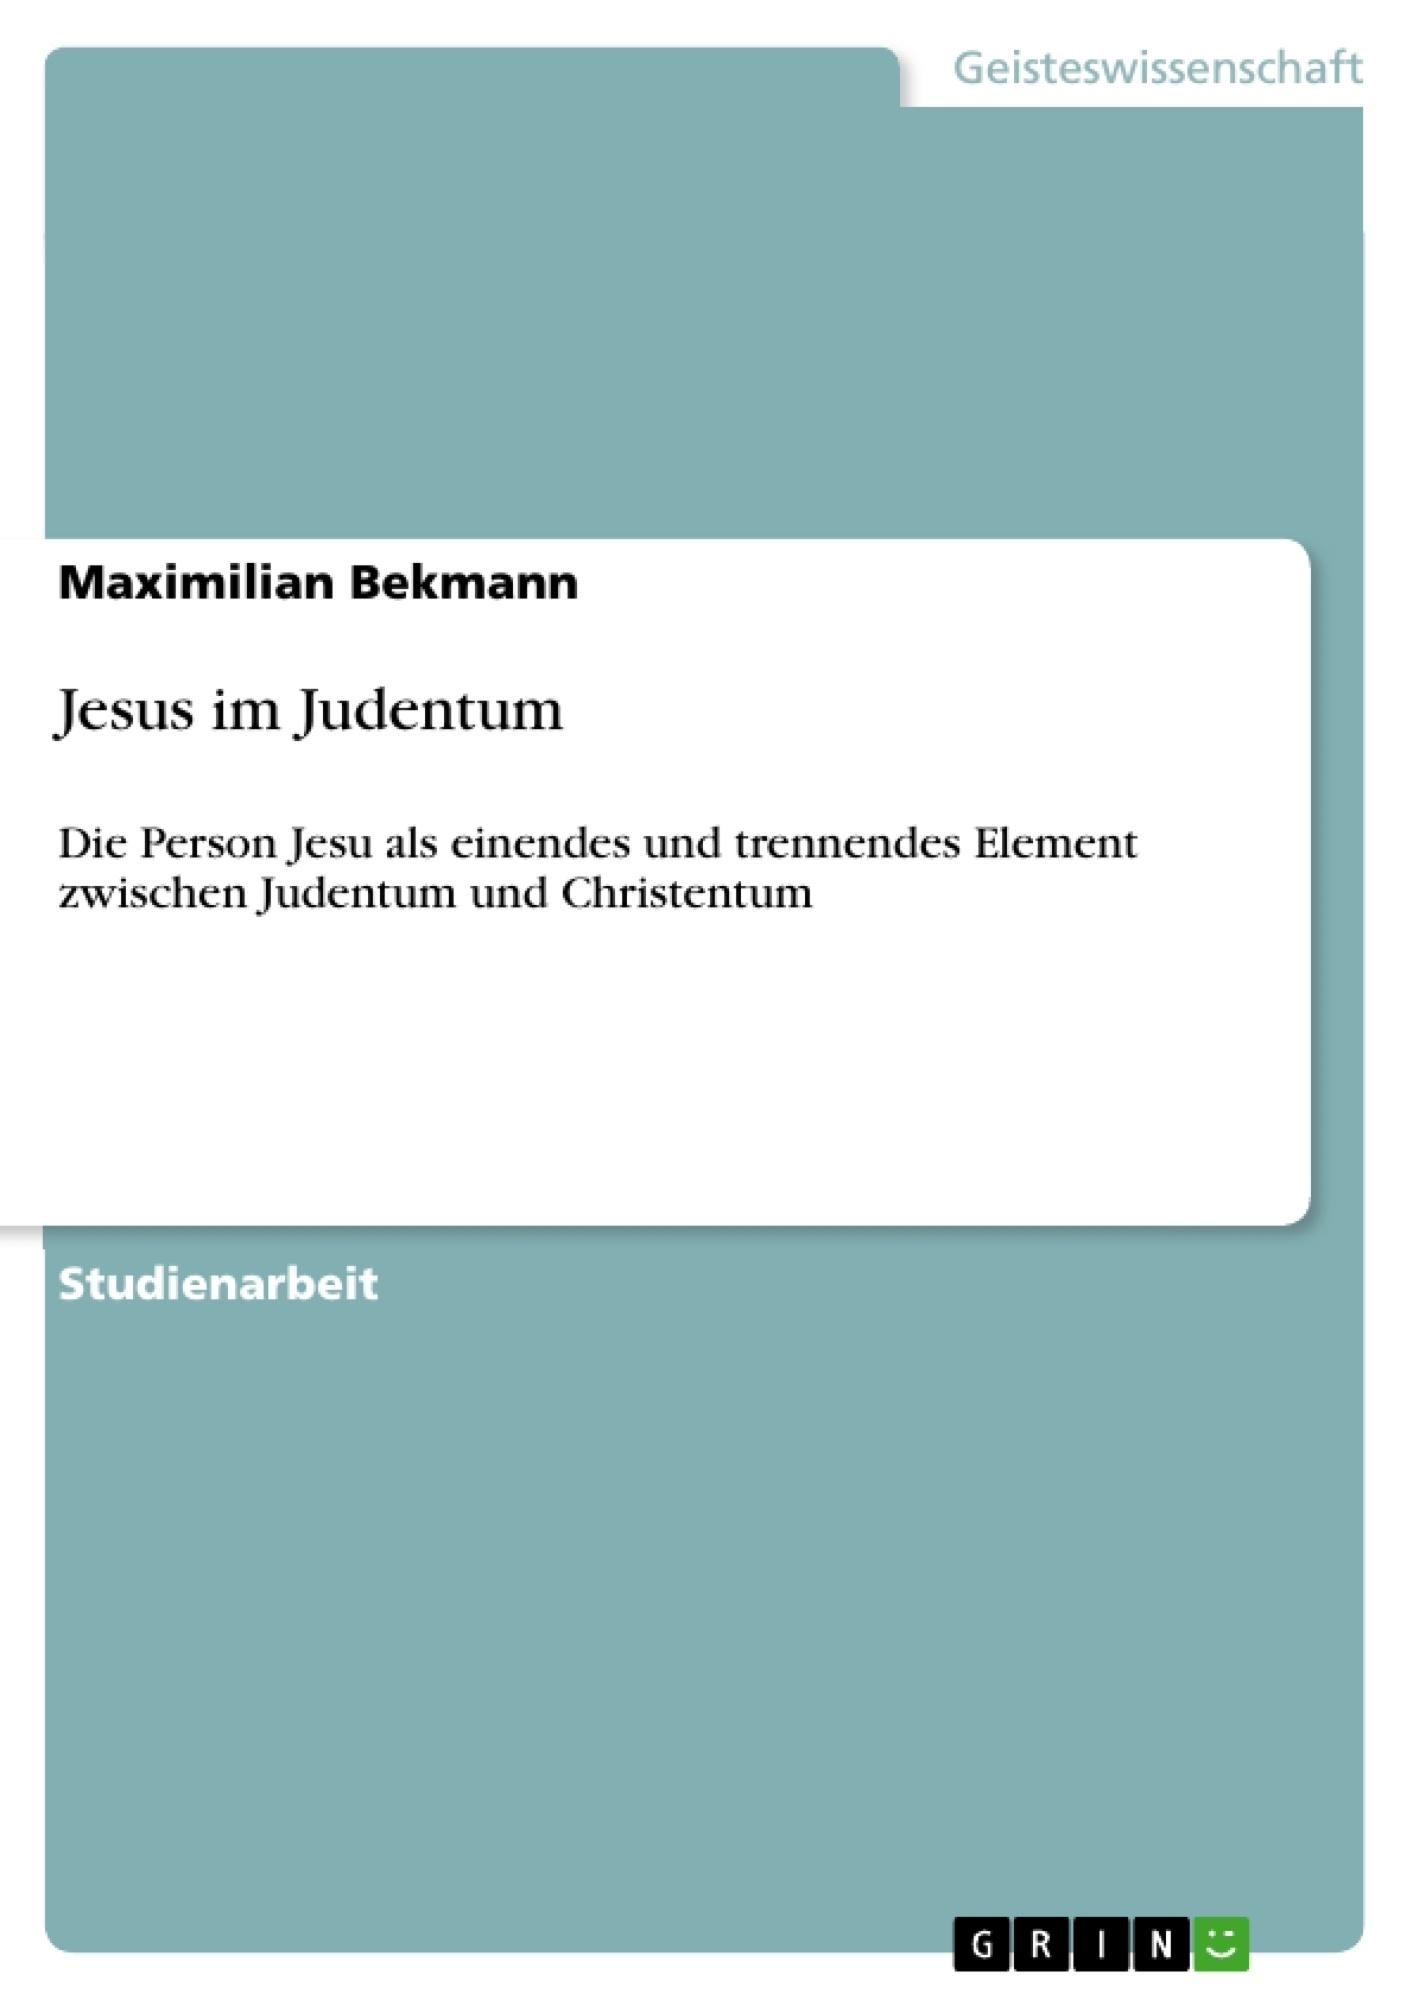 Titel: Jesus im Judentum